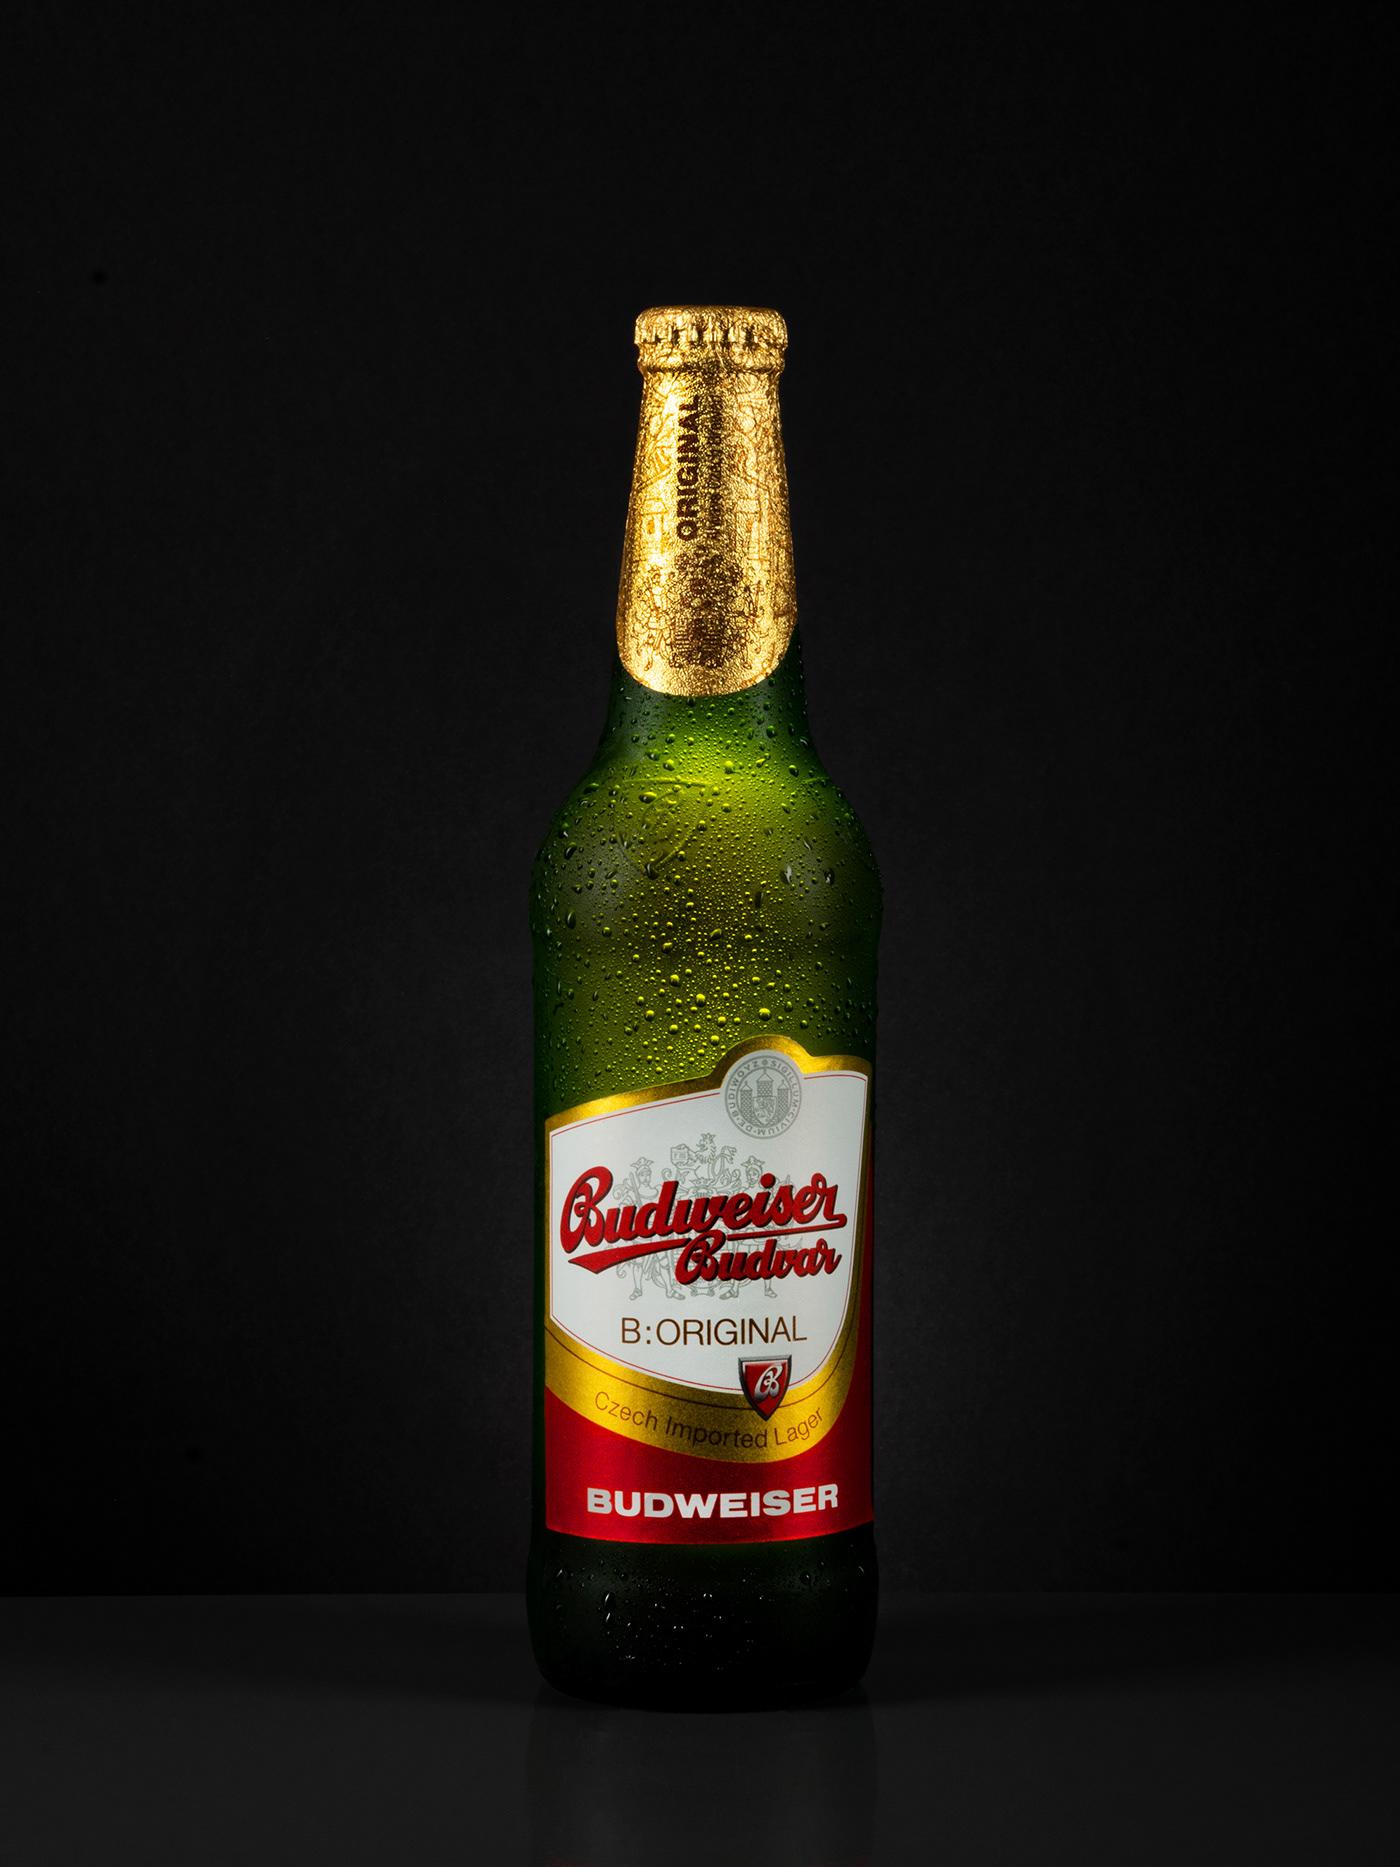 beer Budweiser Packshot Product Photography studio